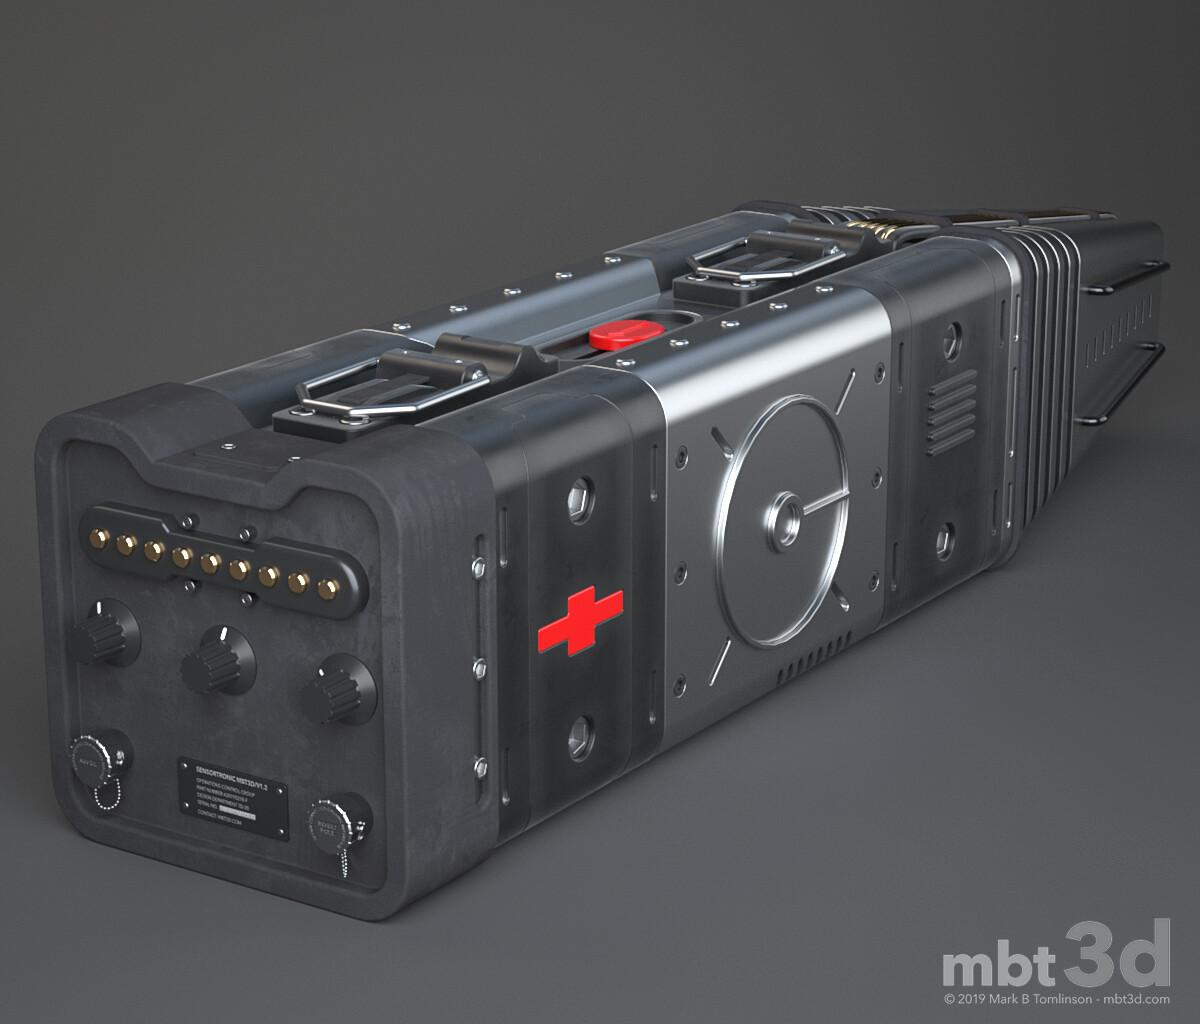 Mark b tomlinson module two 03